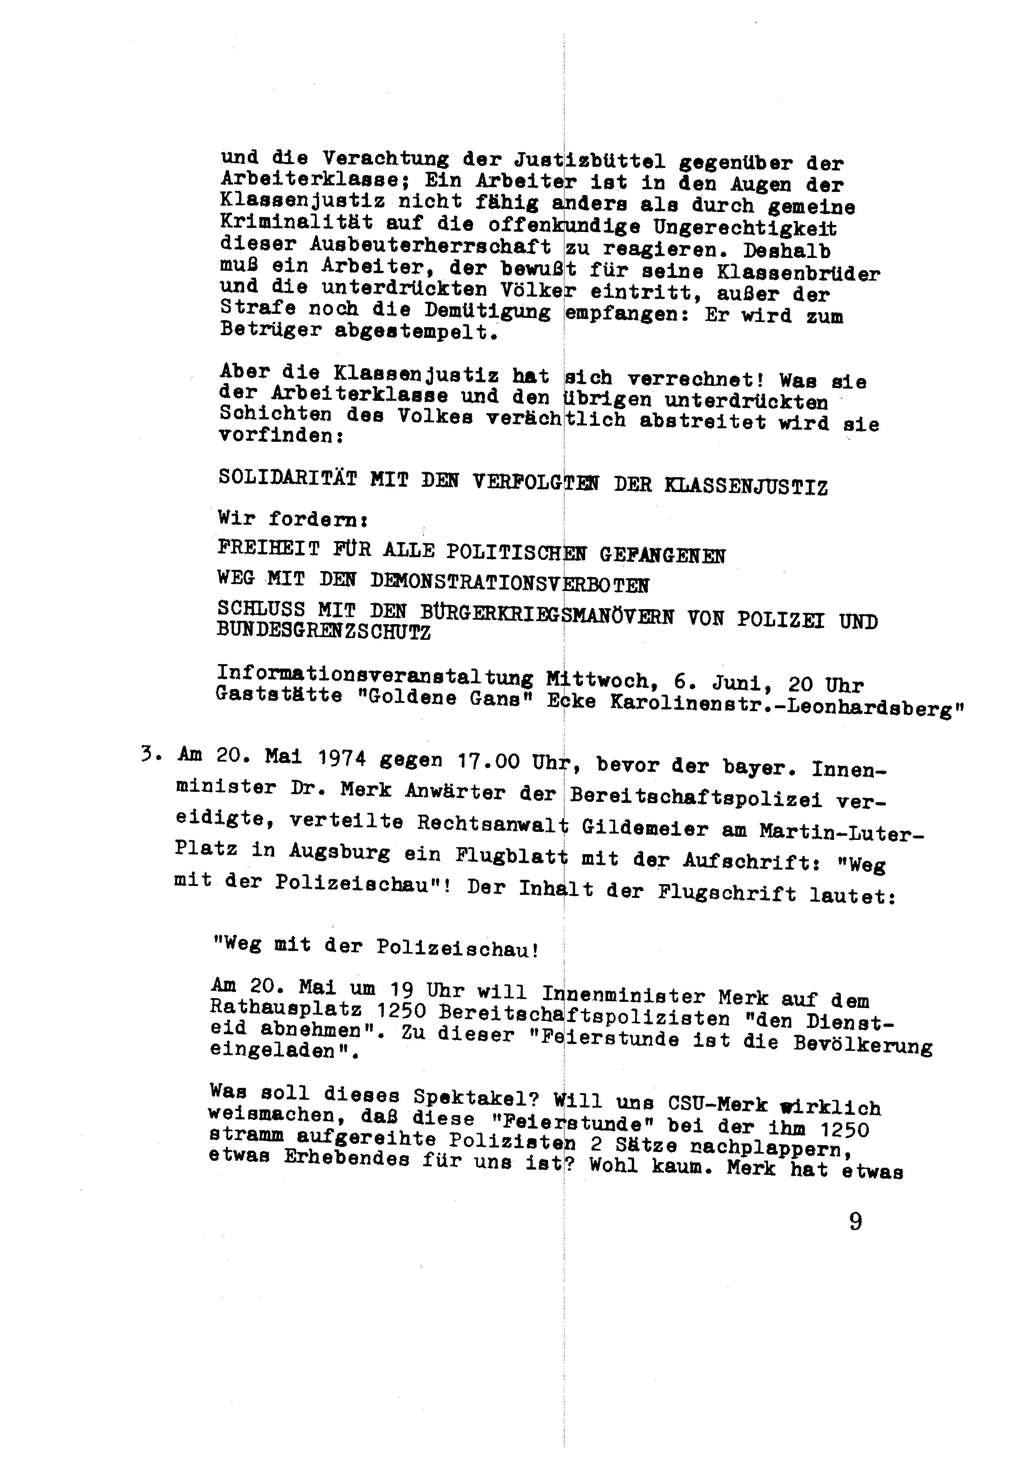 RHeV_Anschuldigung_RA_Gildemeier_Seite_09